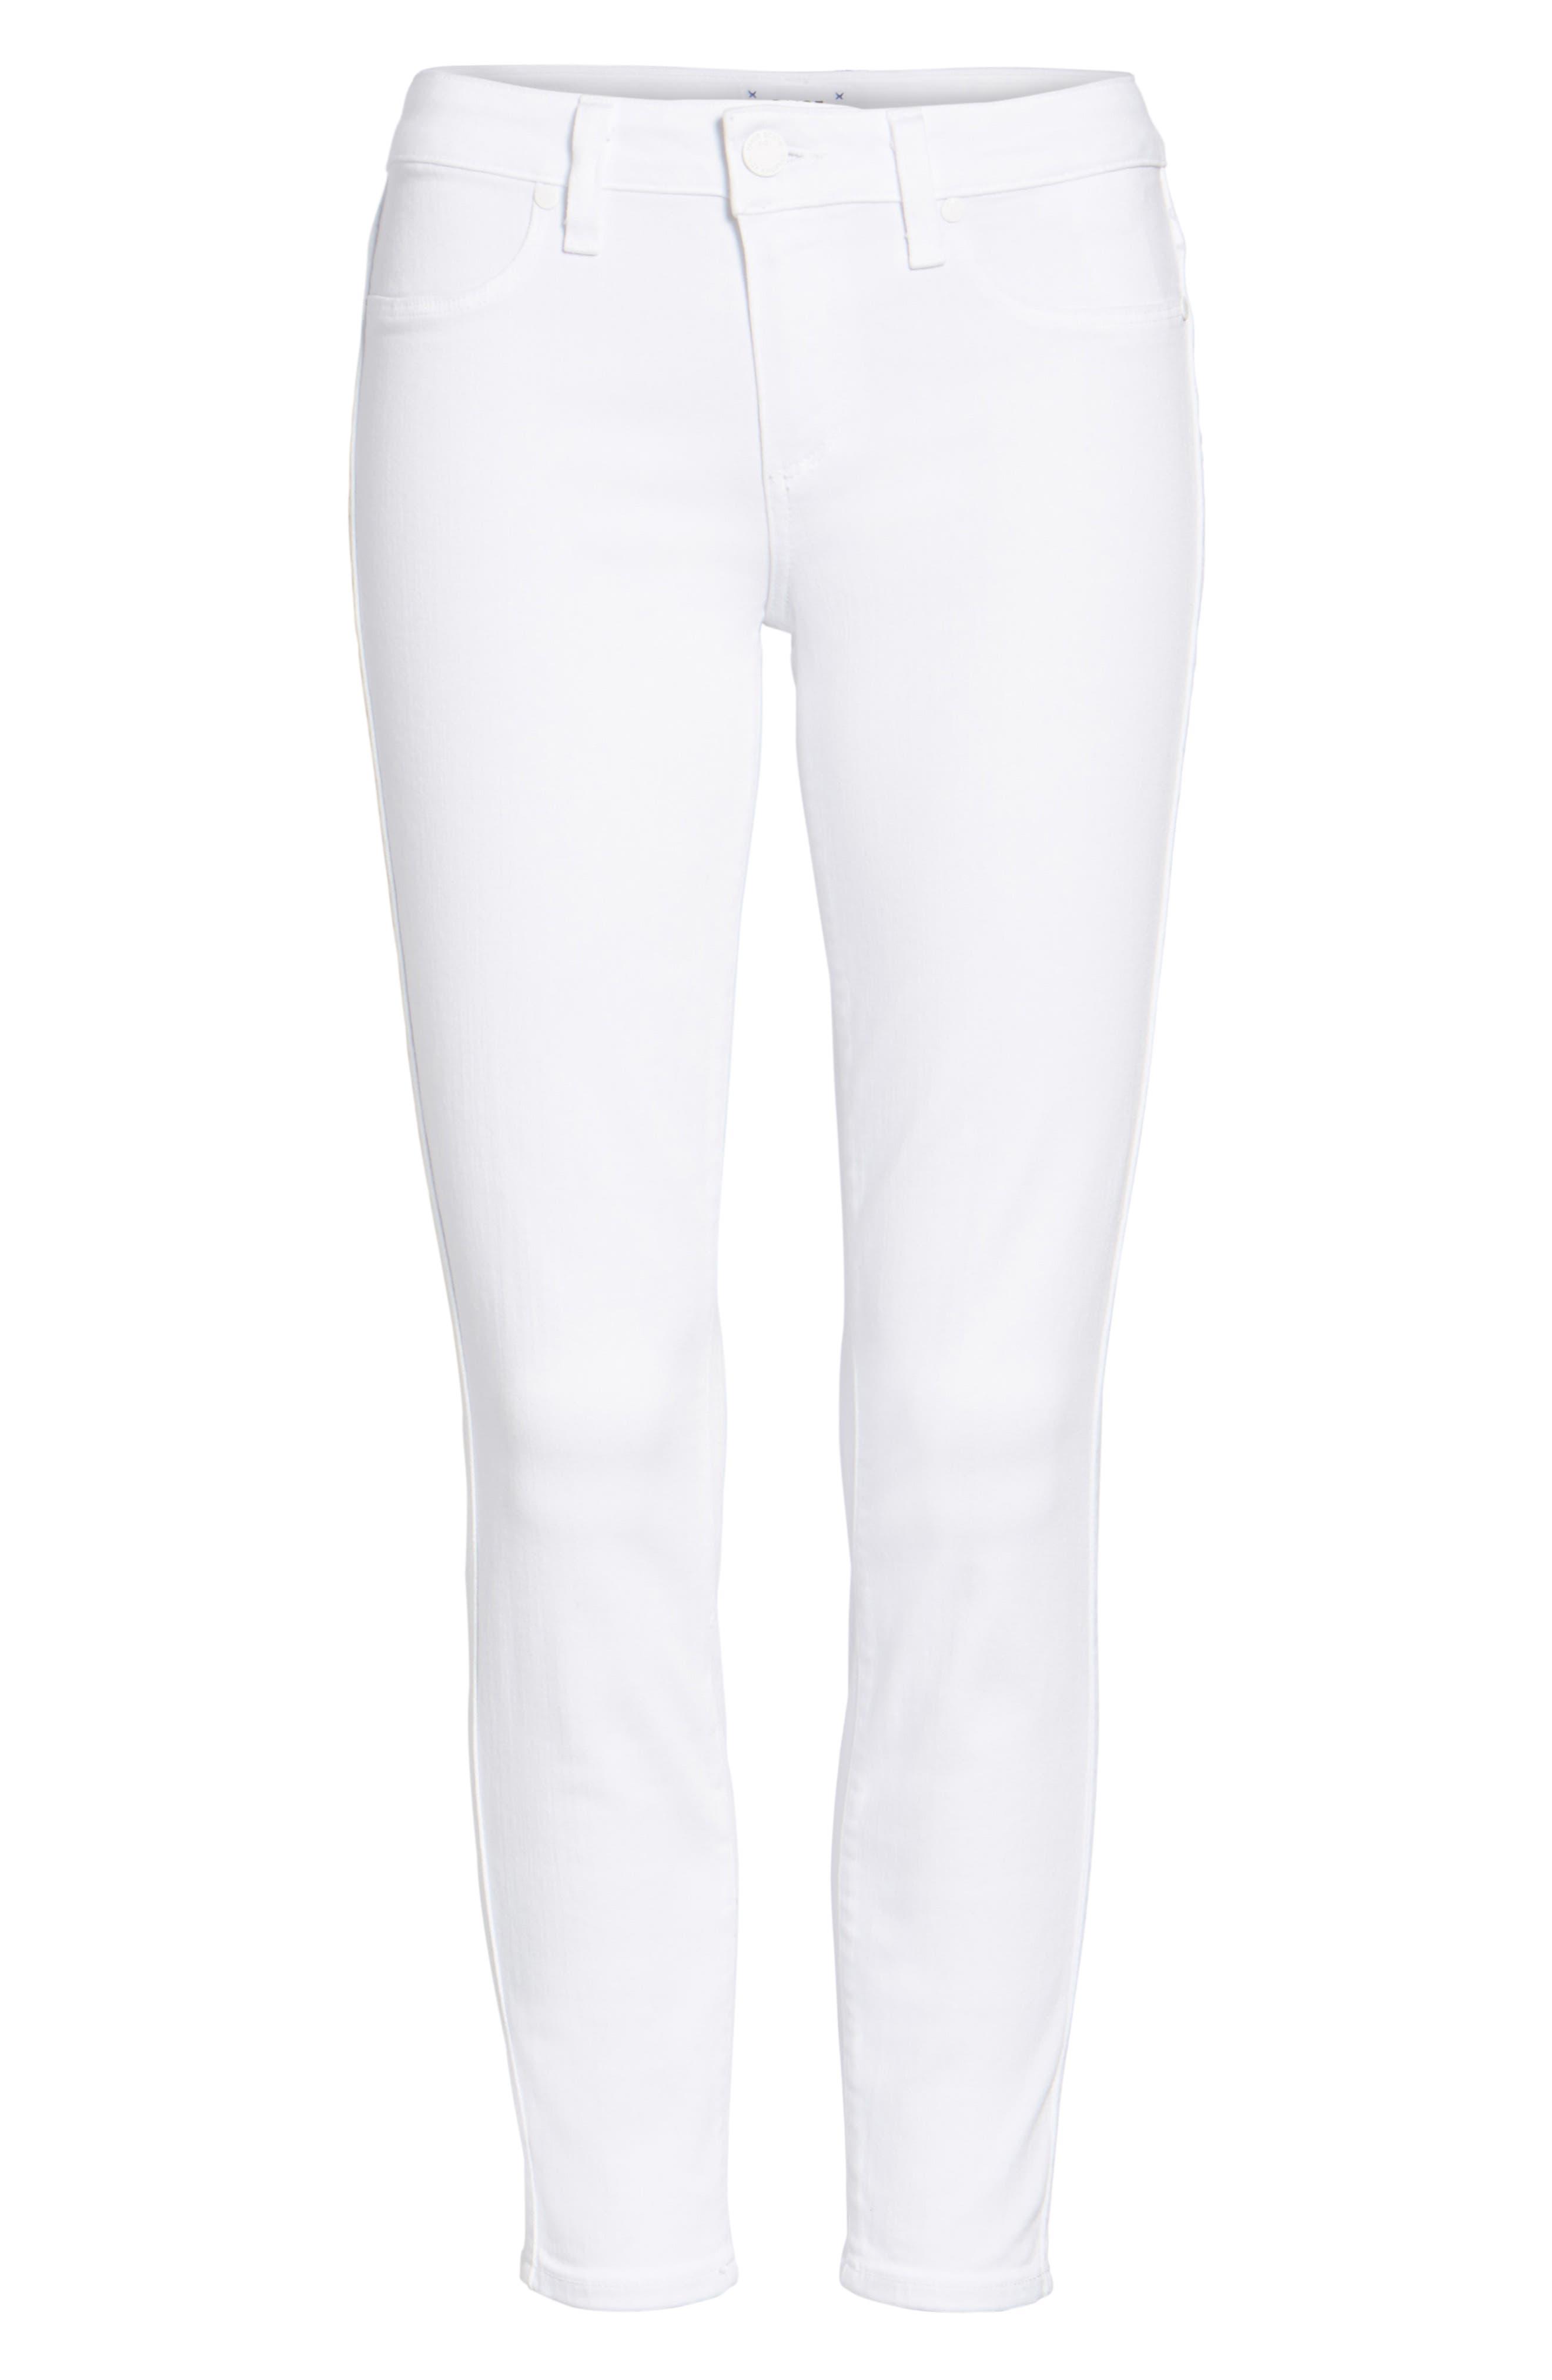 Verdugo Crop Skinny Jeans,                         Main,                         color, 100